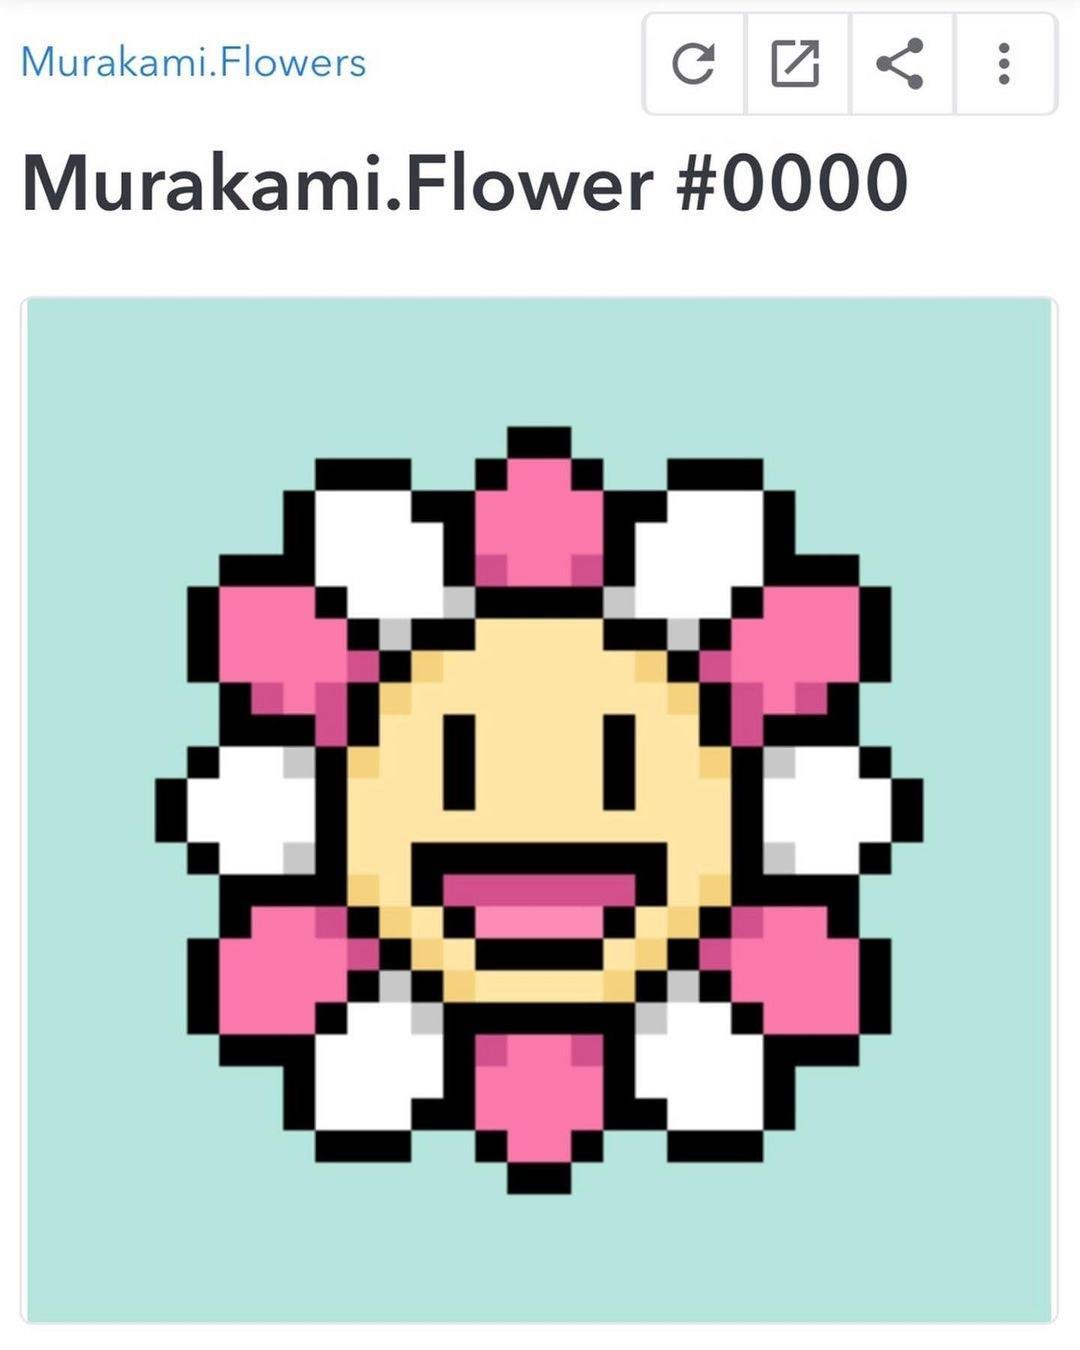 nft تاکاشی موراکامی